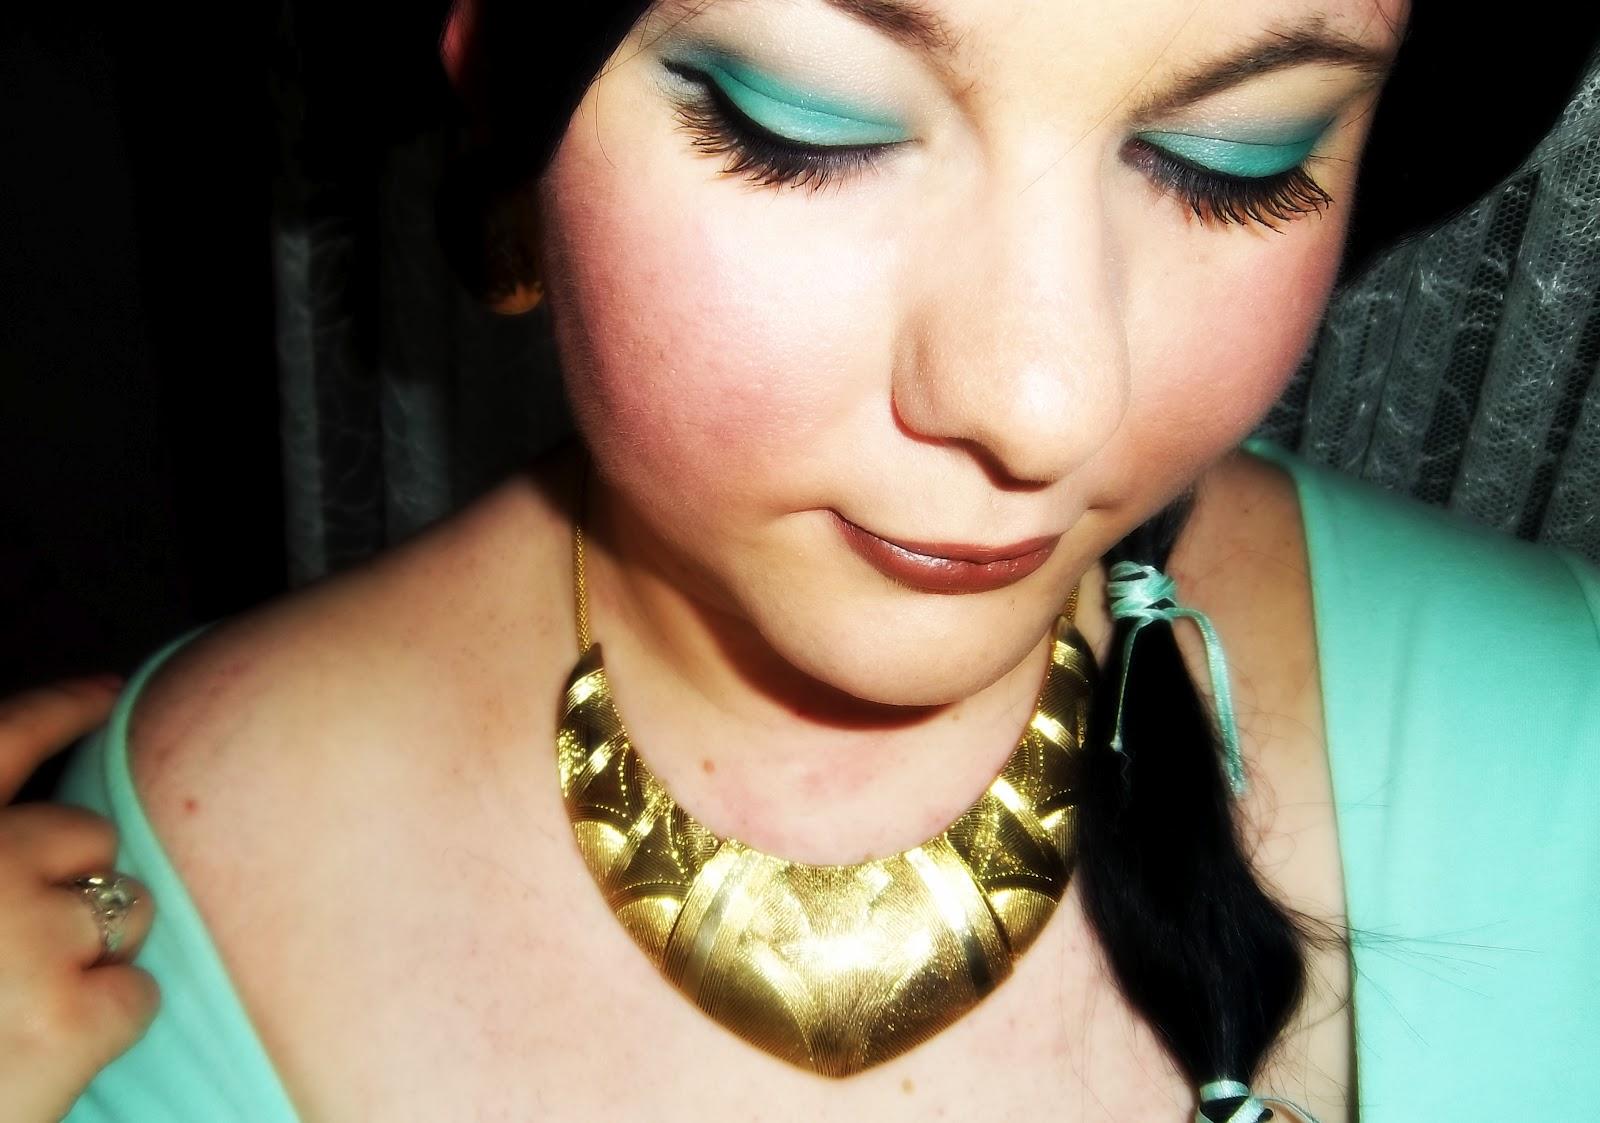 TUTORIAL: JASMINE Disney Princess from Aladdin Makeup